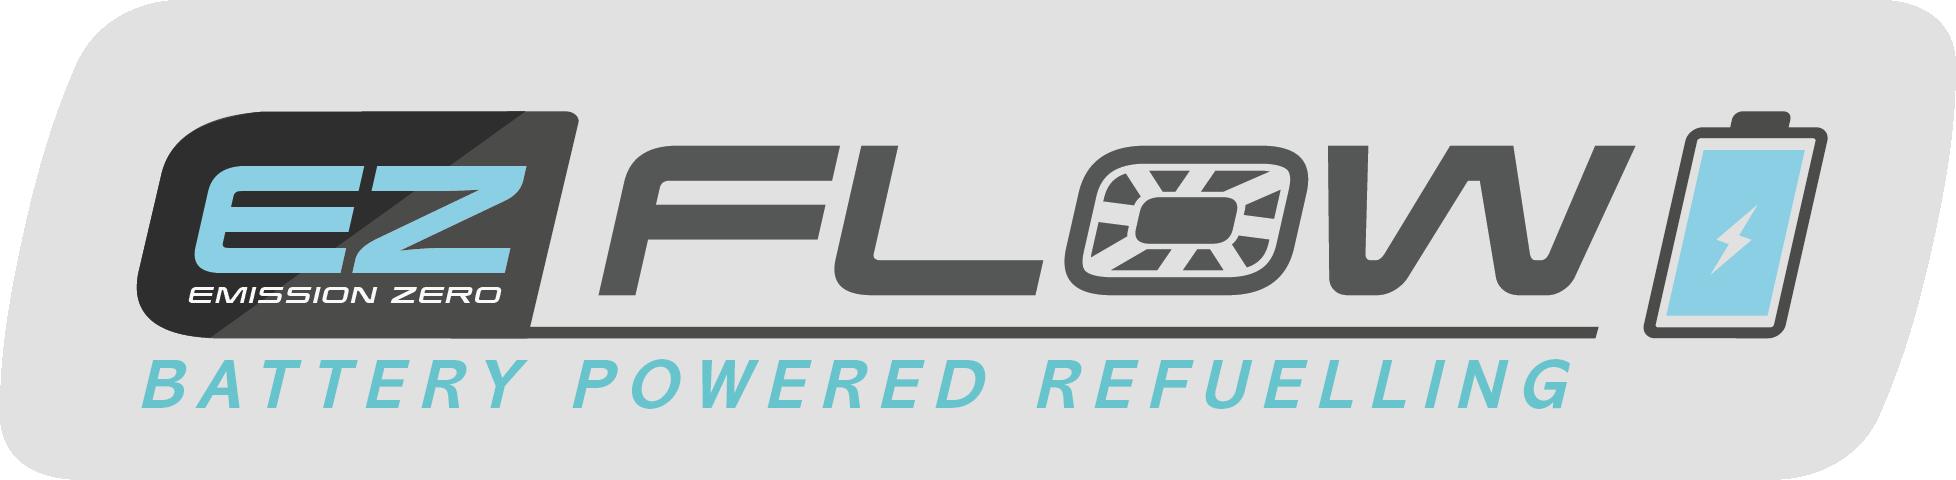 EZ FLOW logo